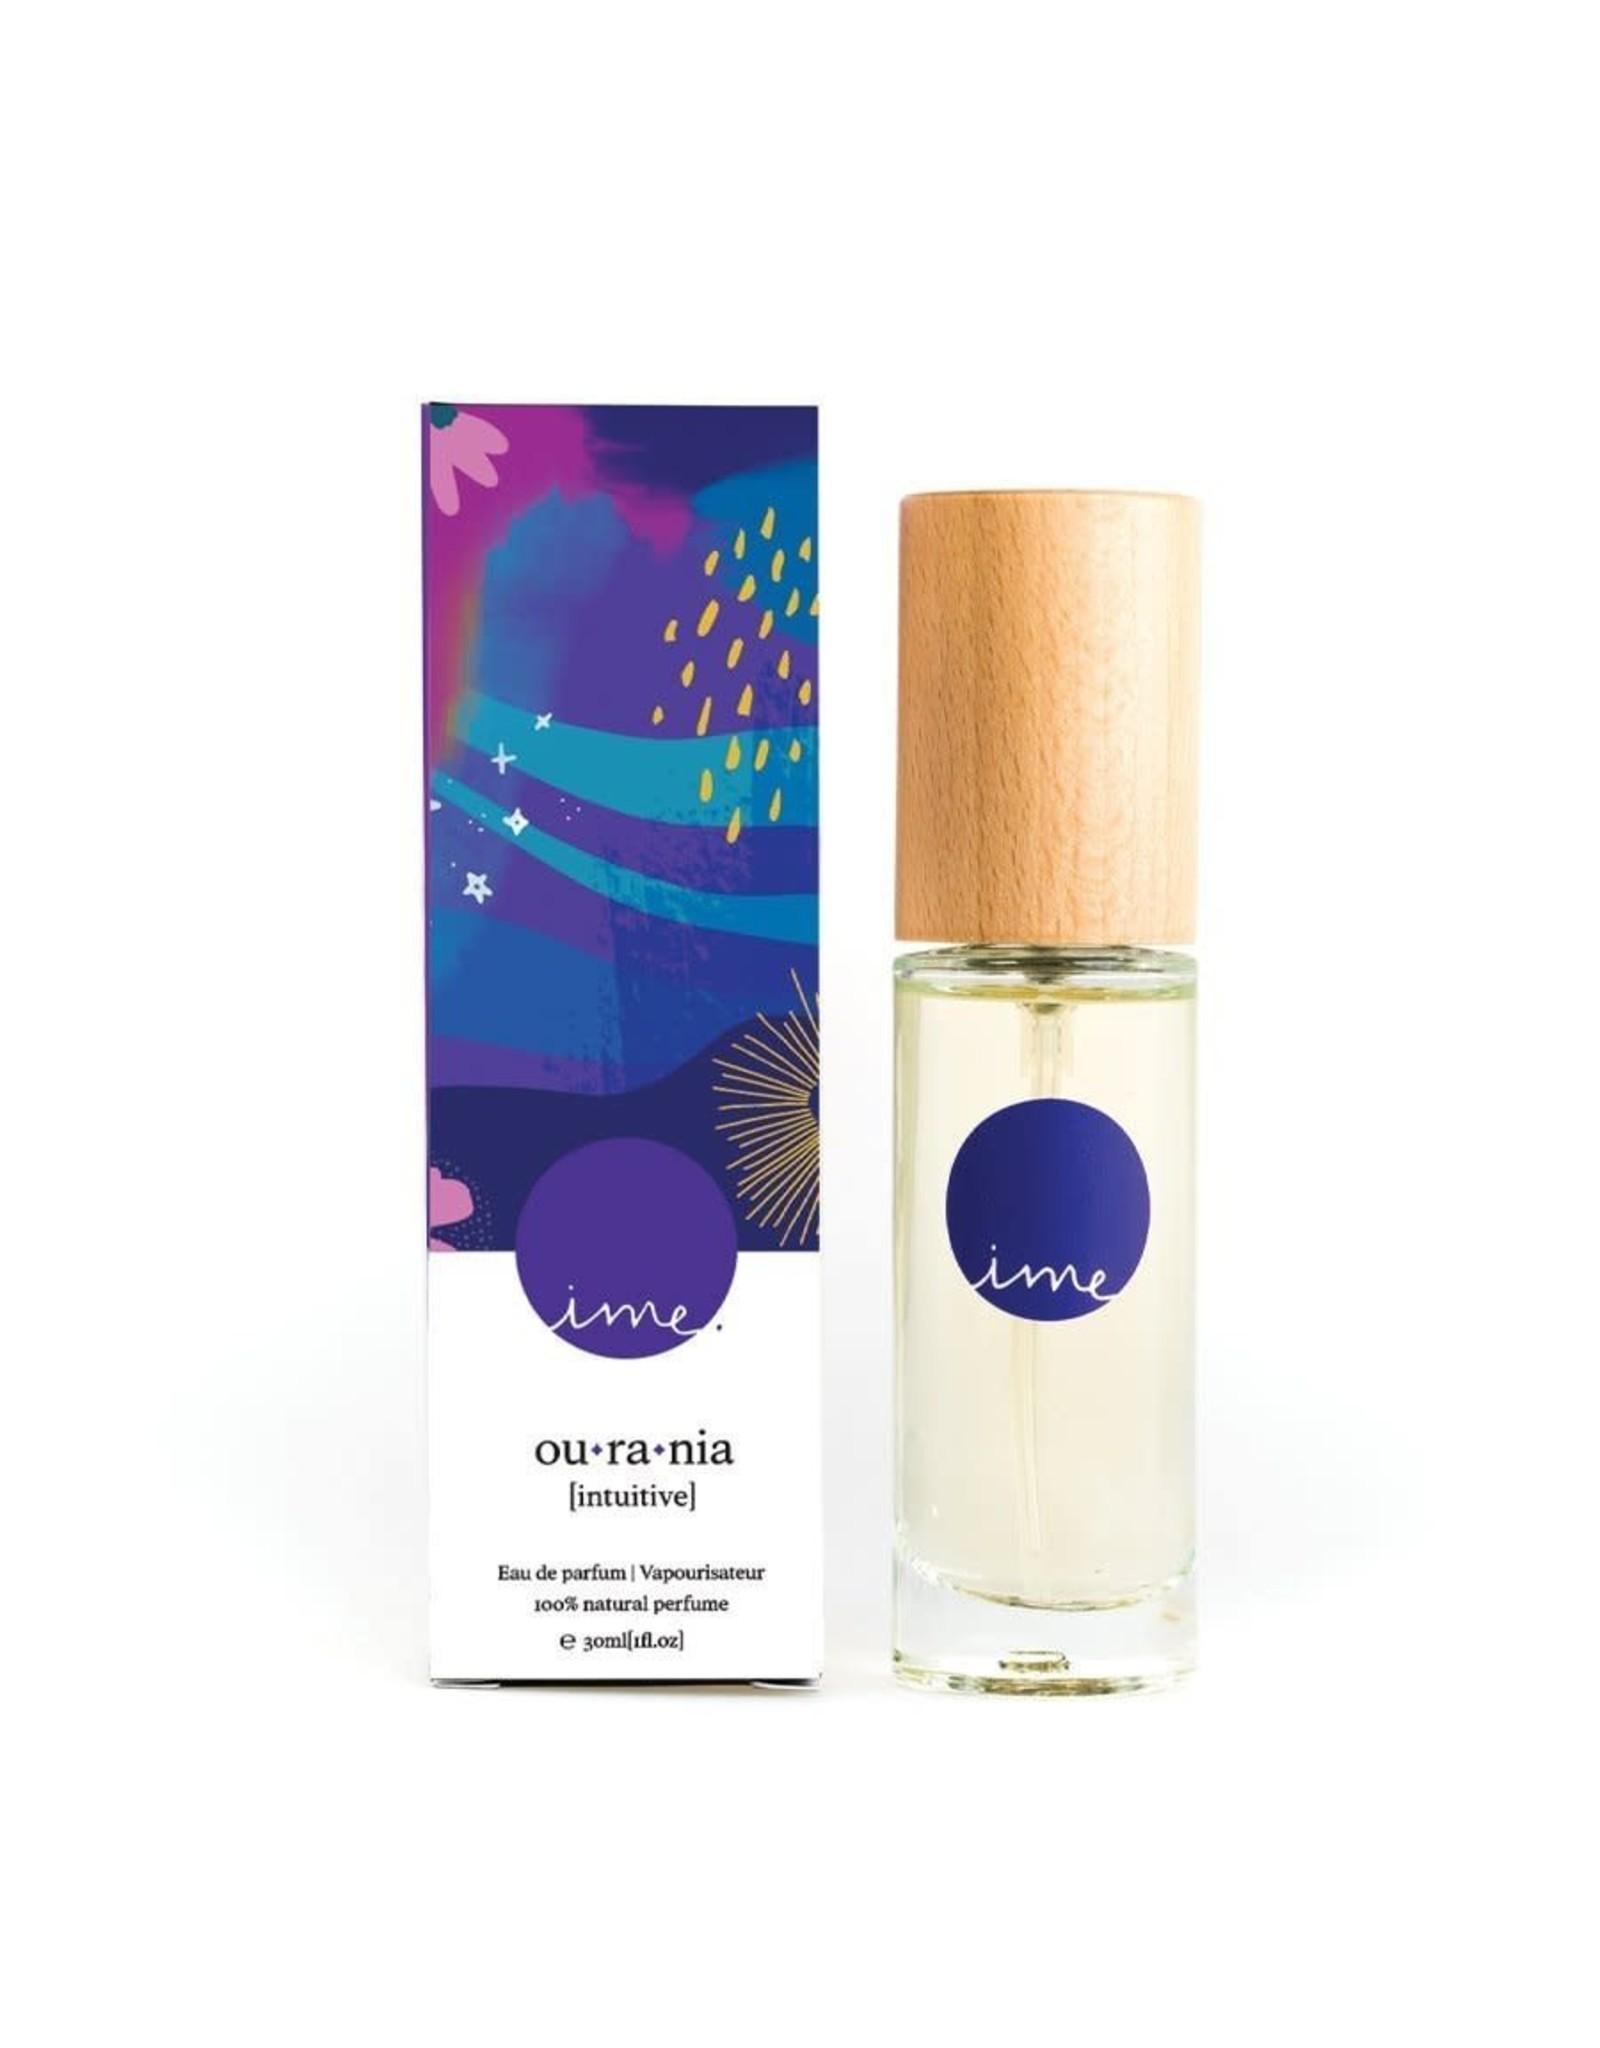 IME Natural Perfume - Ourania (Intuitive) - 30ml